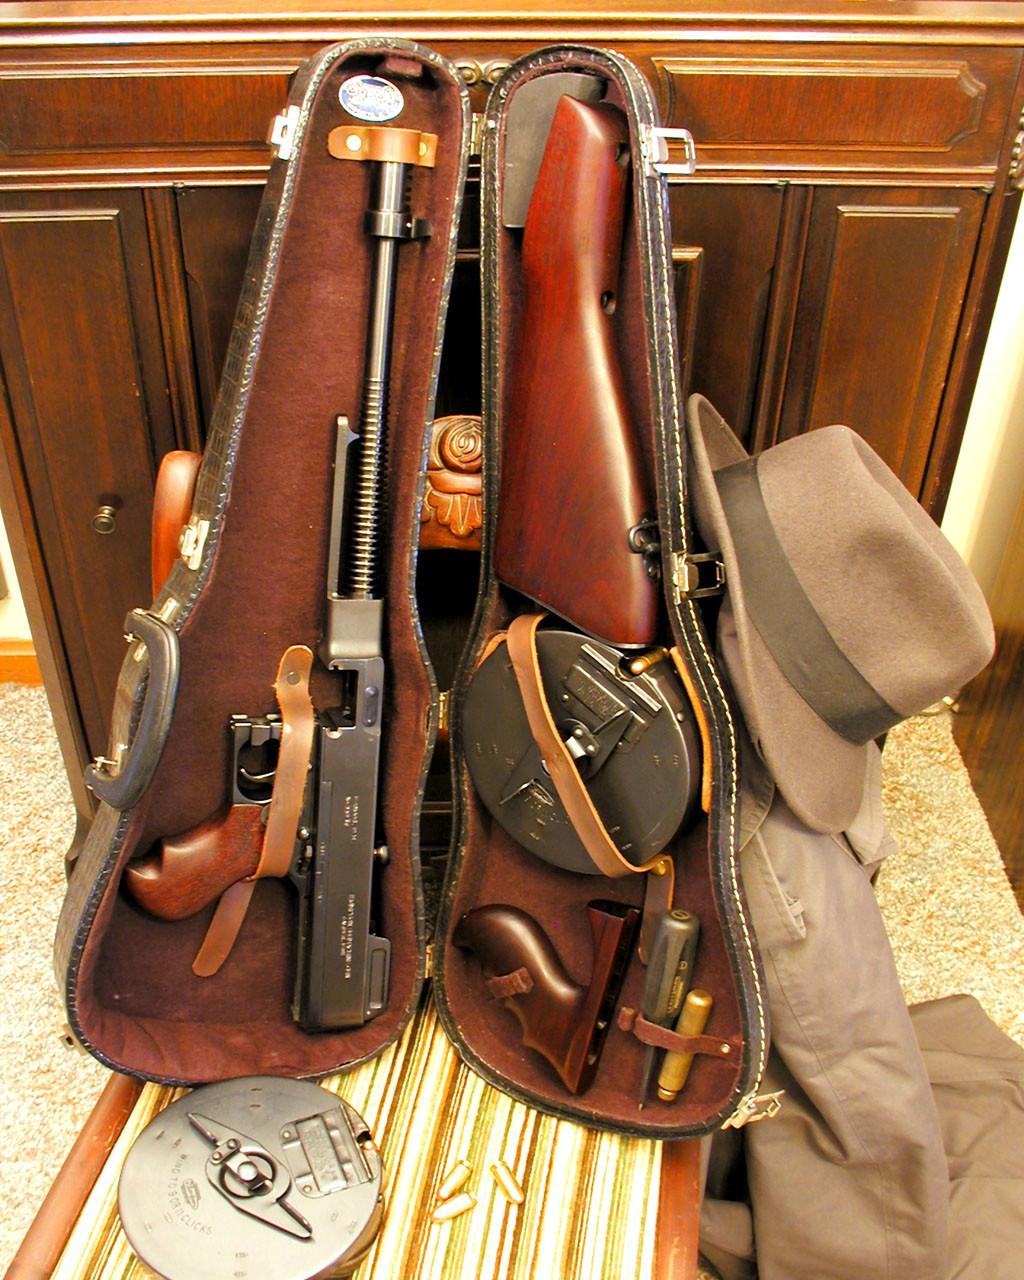 1928 Tommy gun inside a violin case.